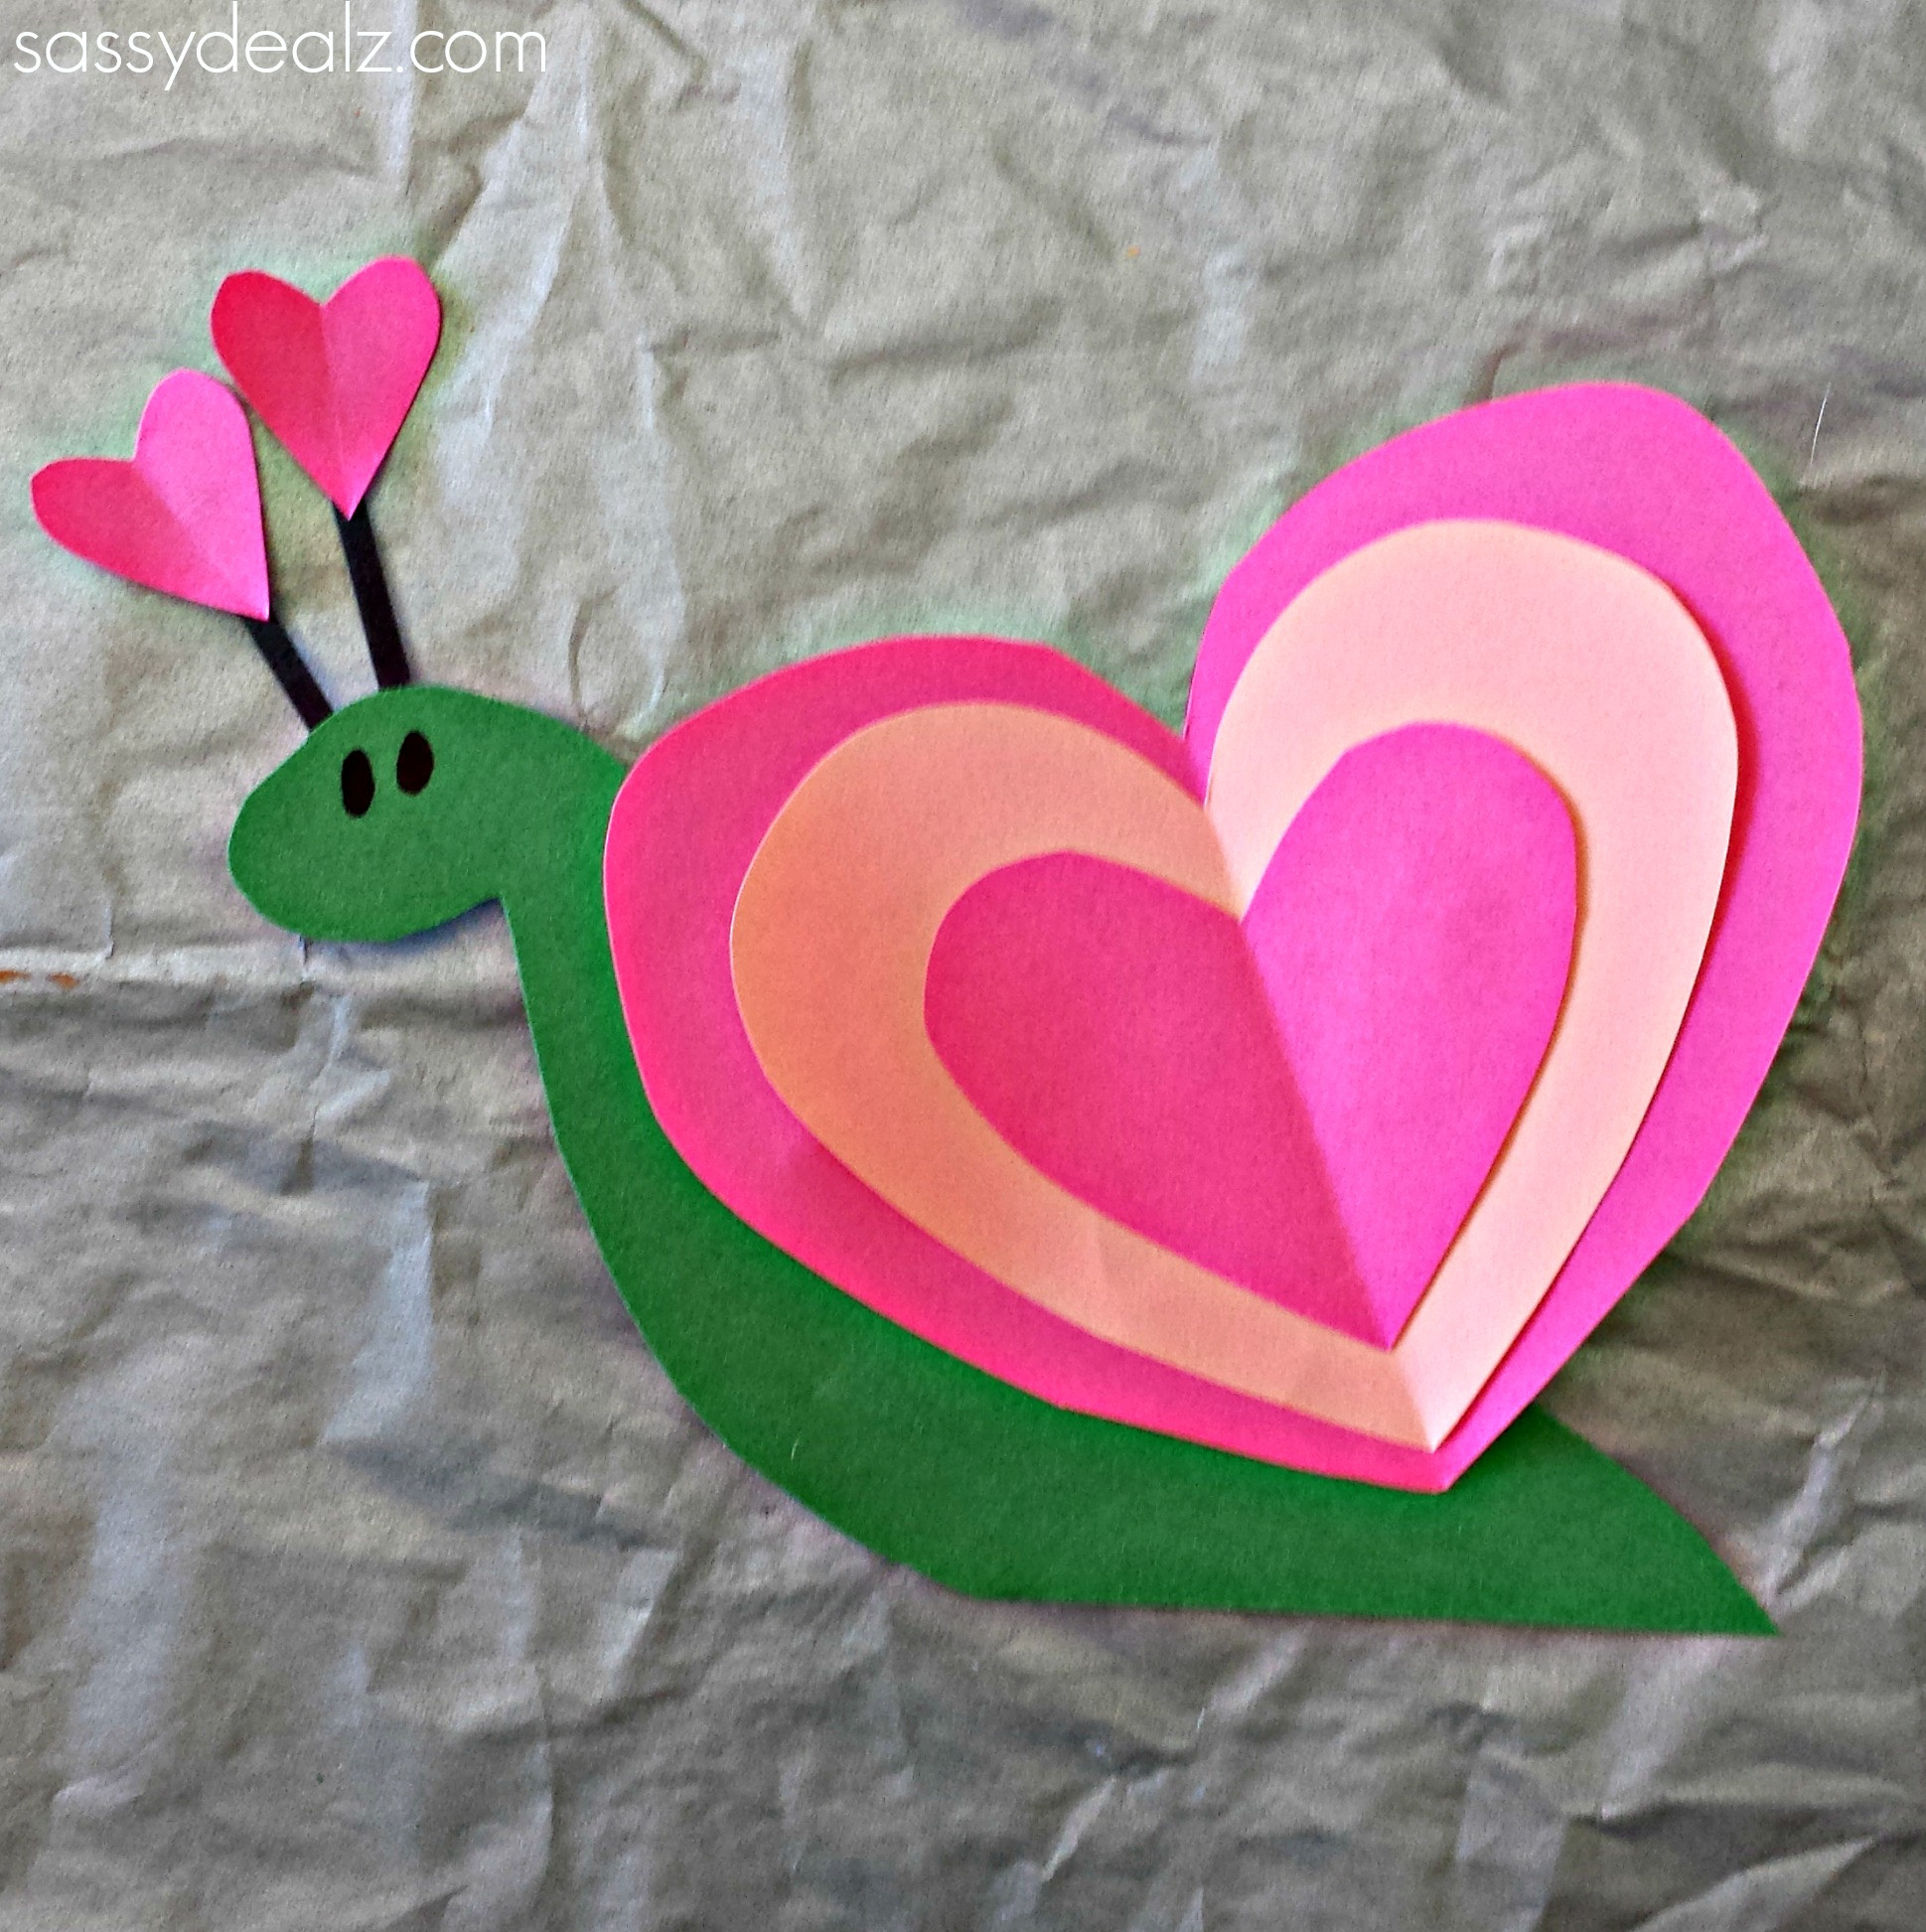 Valentine Craft Ideas For Preschoolers  Heart Snail Craft For Kids Valentine Art Project